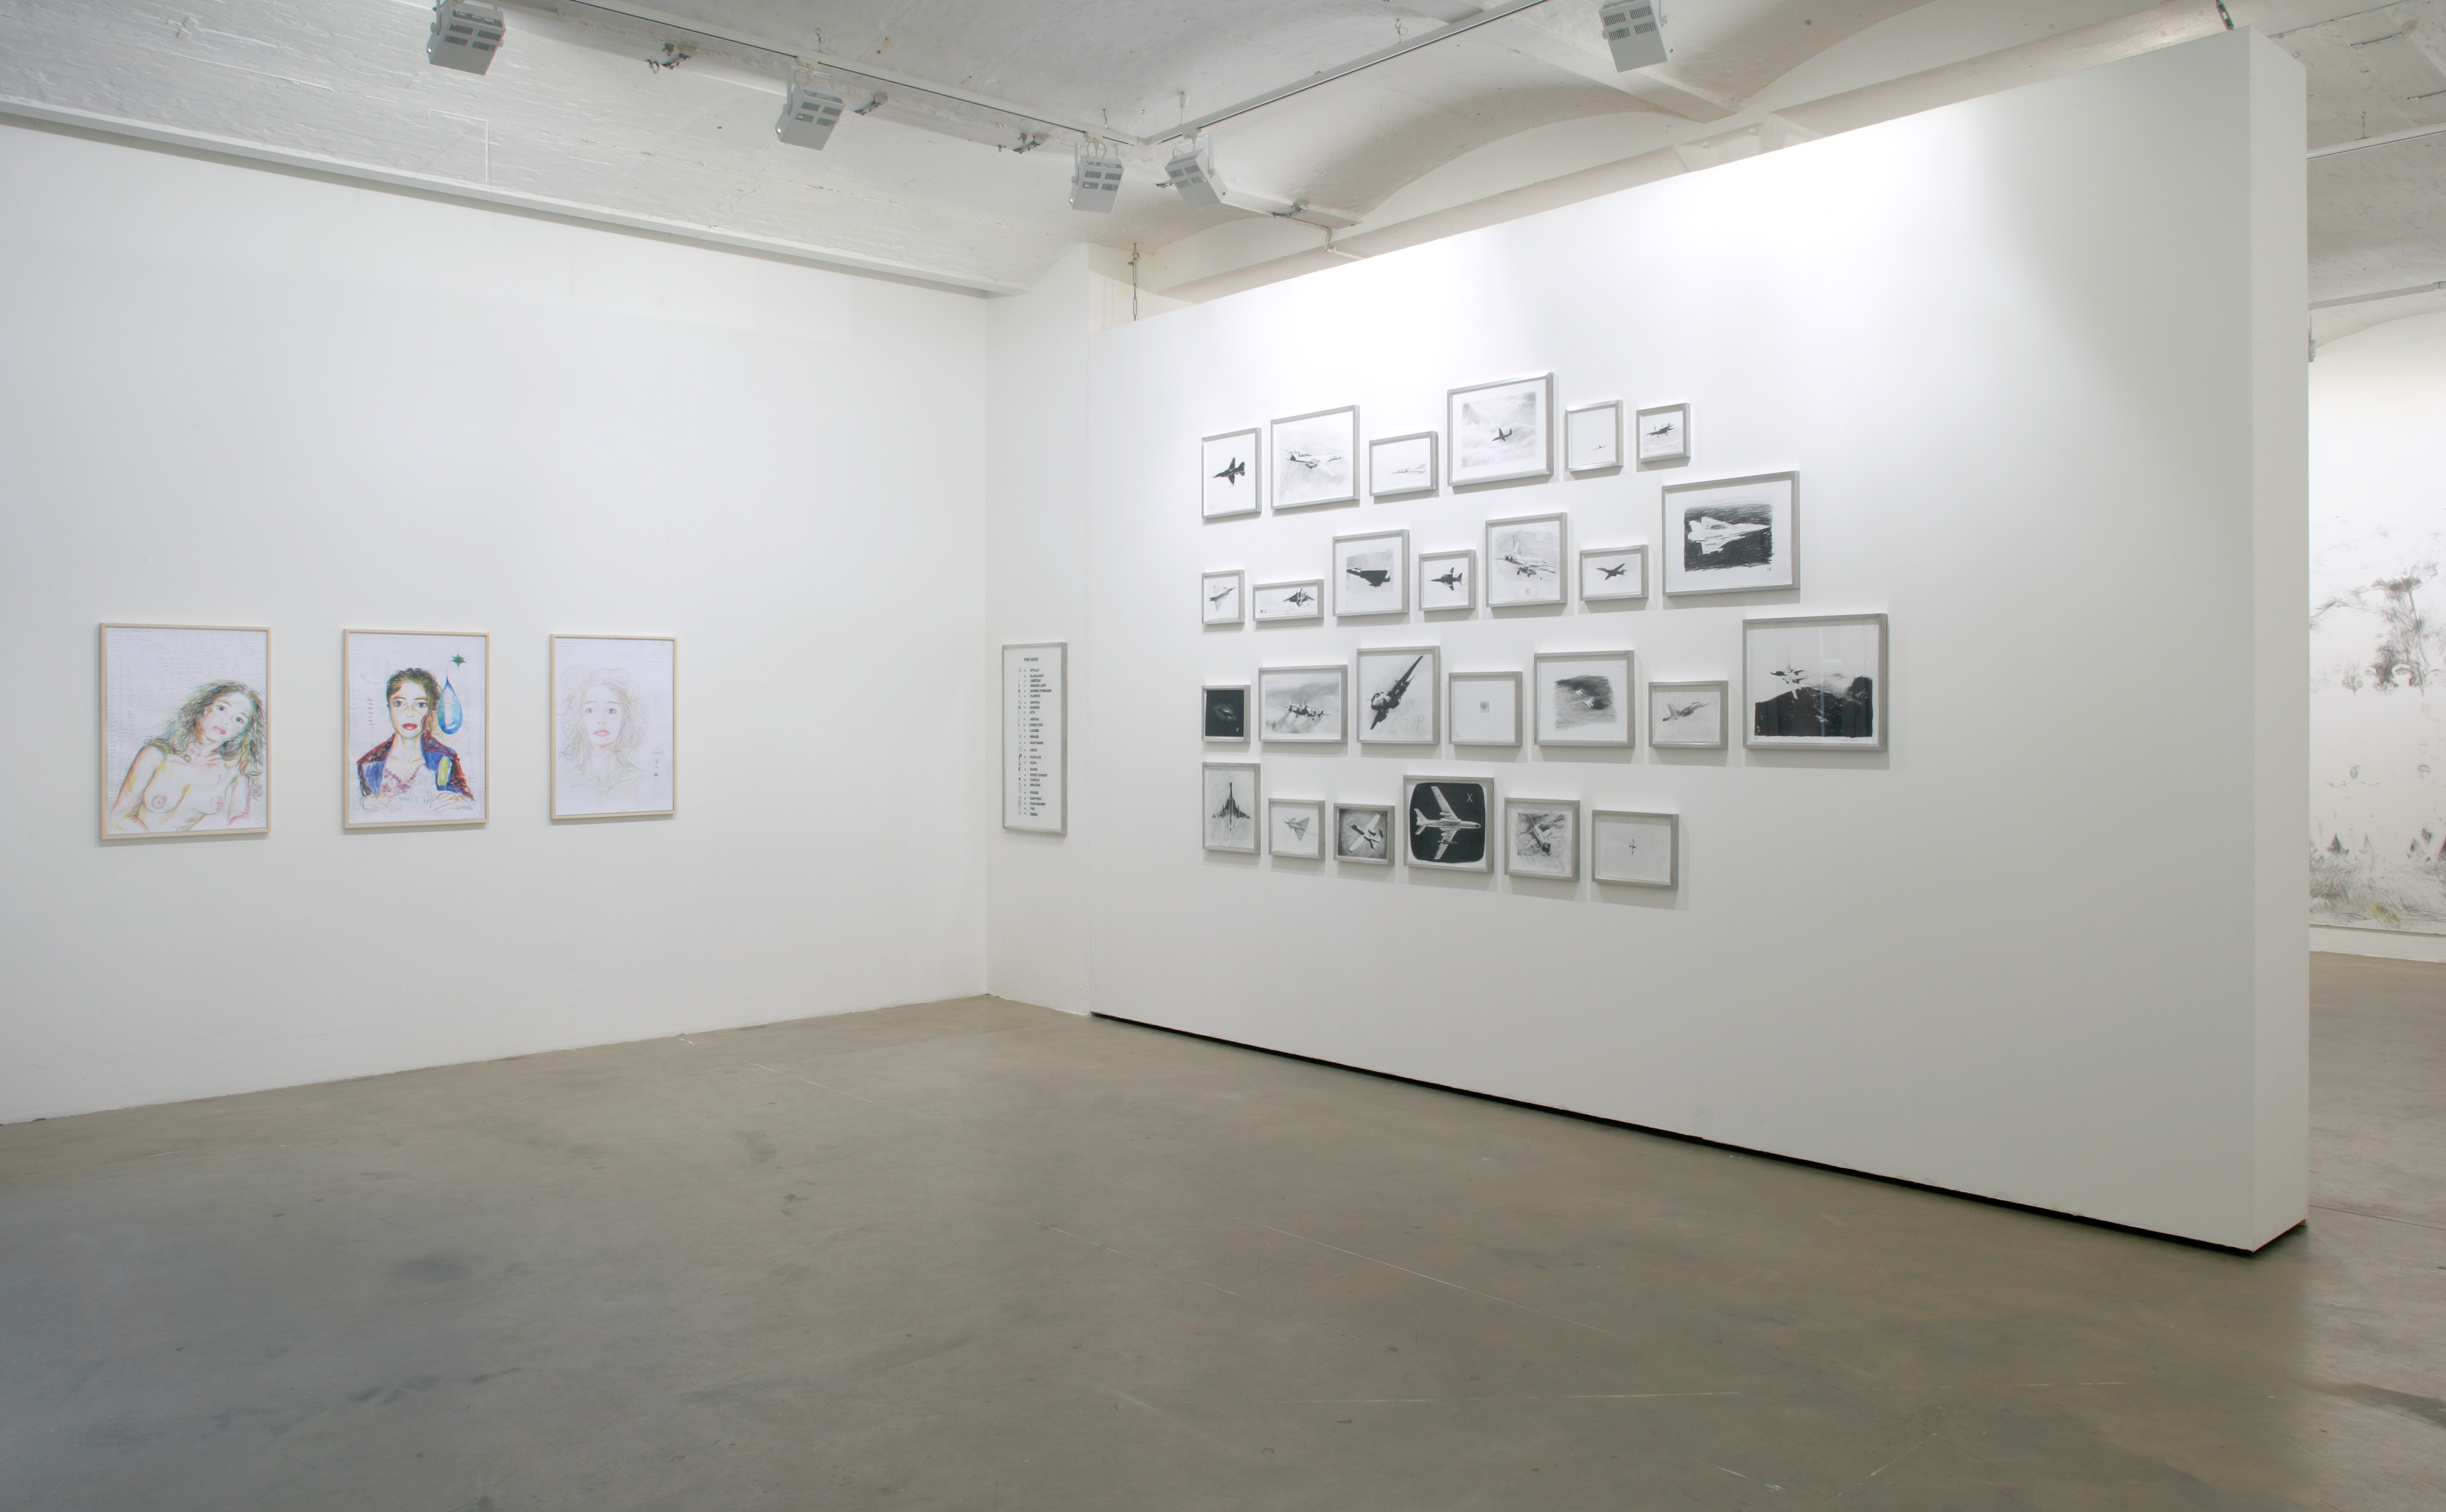 Galerie Barbara Thumm \ Fiona Banner aka The Vanity Press – I walk the lines